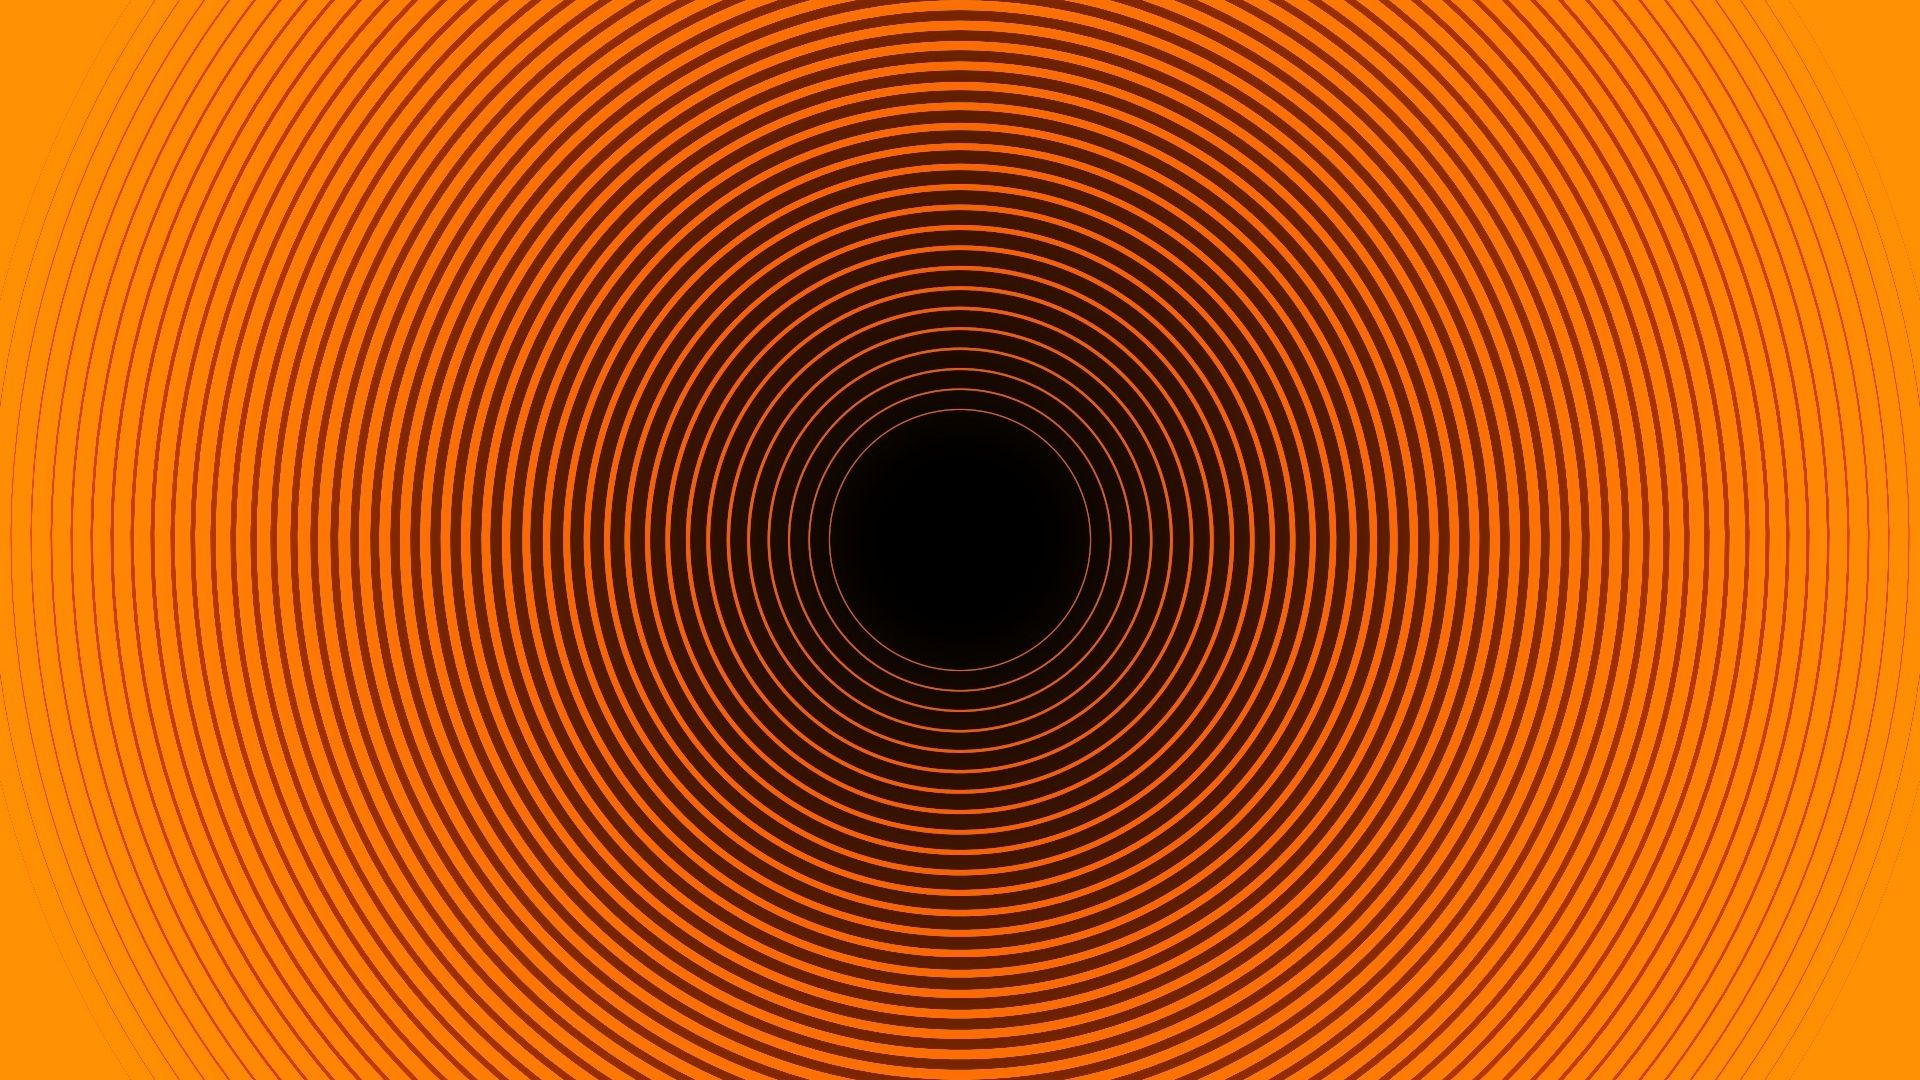 Rotation Optical Illusion Circles Http Www Wallpapers4u Org Rotation Optical Illusion Circles Optical Illusion Wallpaper 3d Eye Illusions Abstract 3d effect optical illusion wallpaper